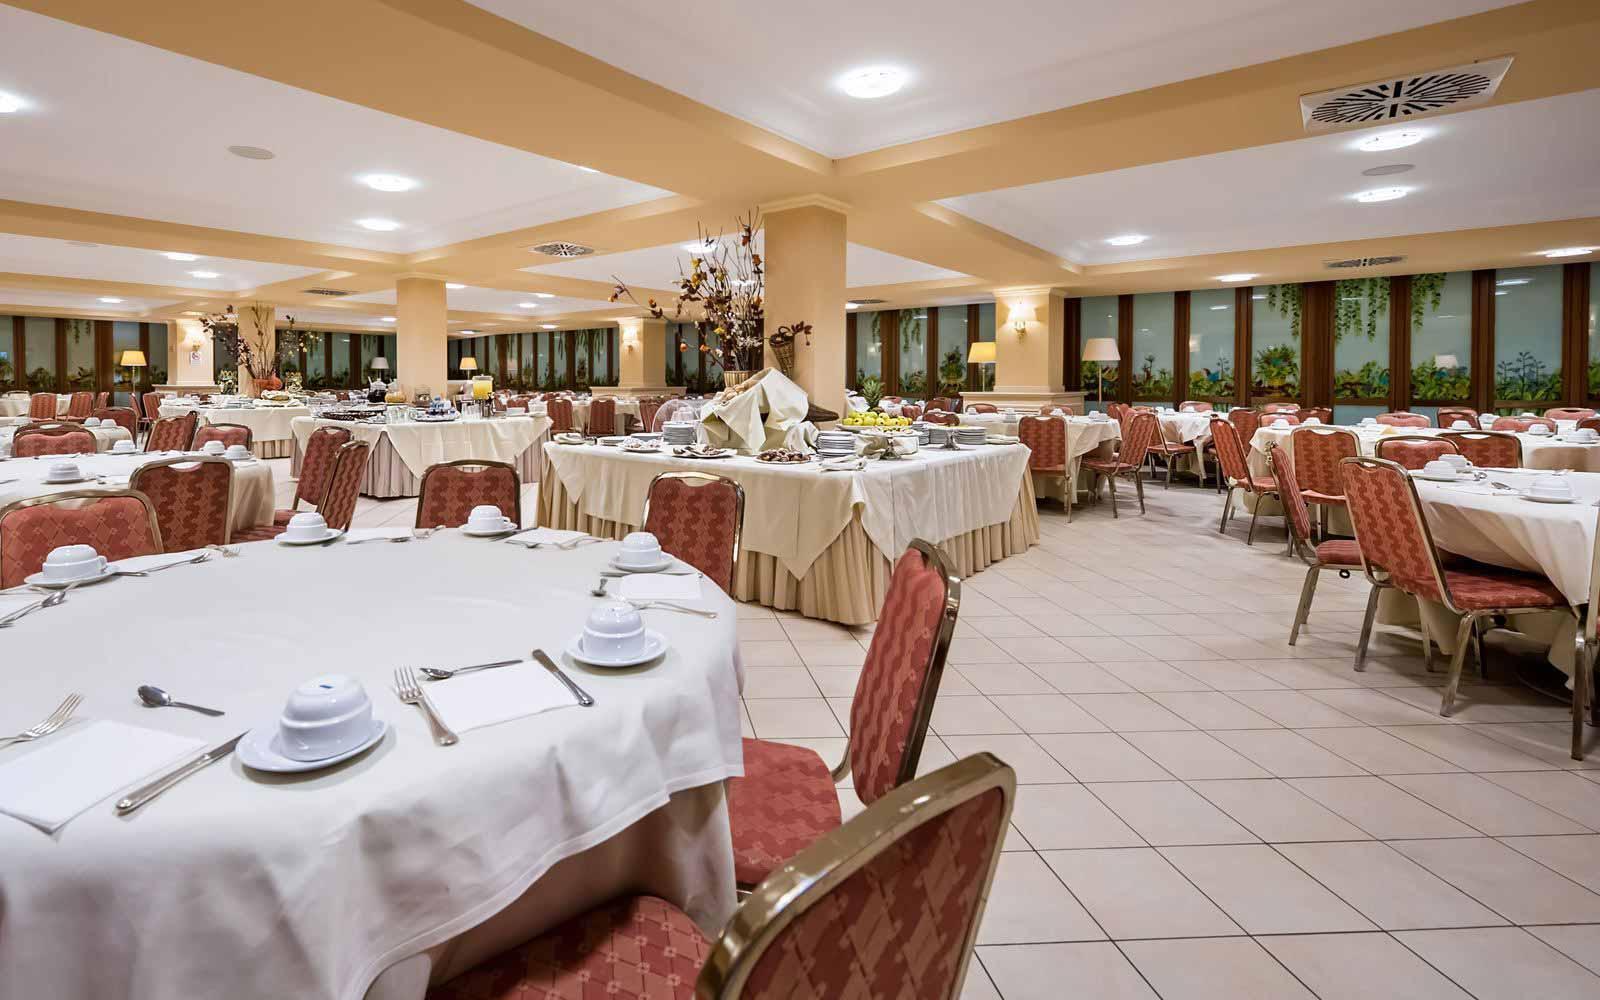 Restaurant at Dioscuri Bay Palace